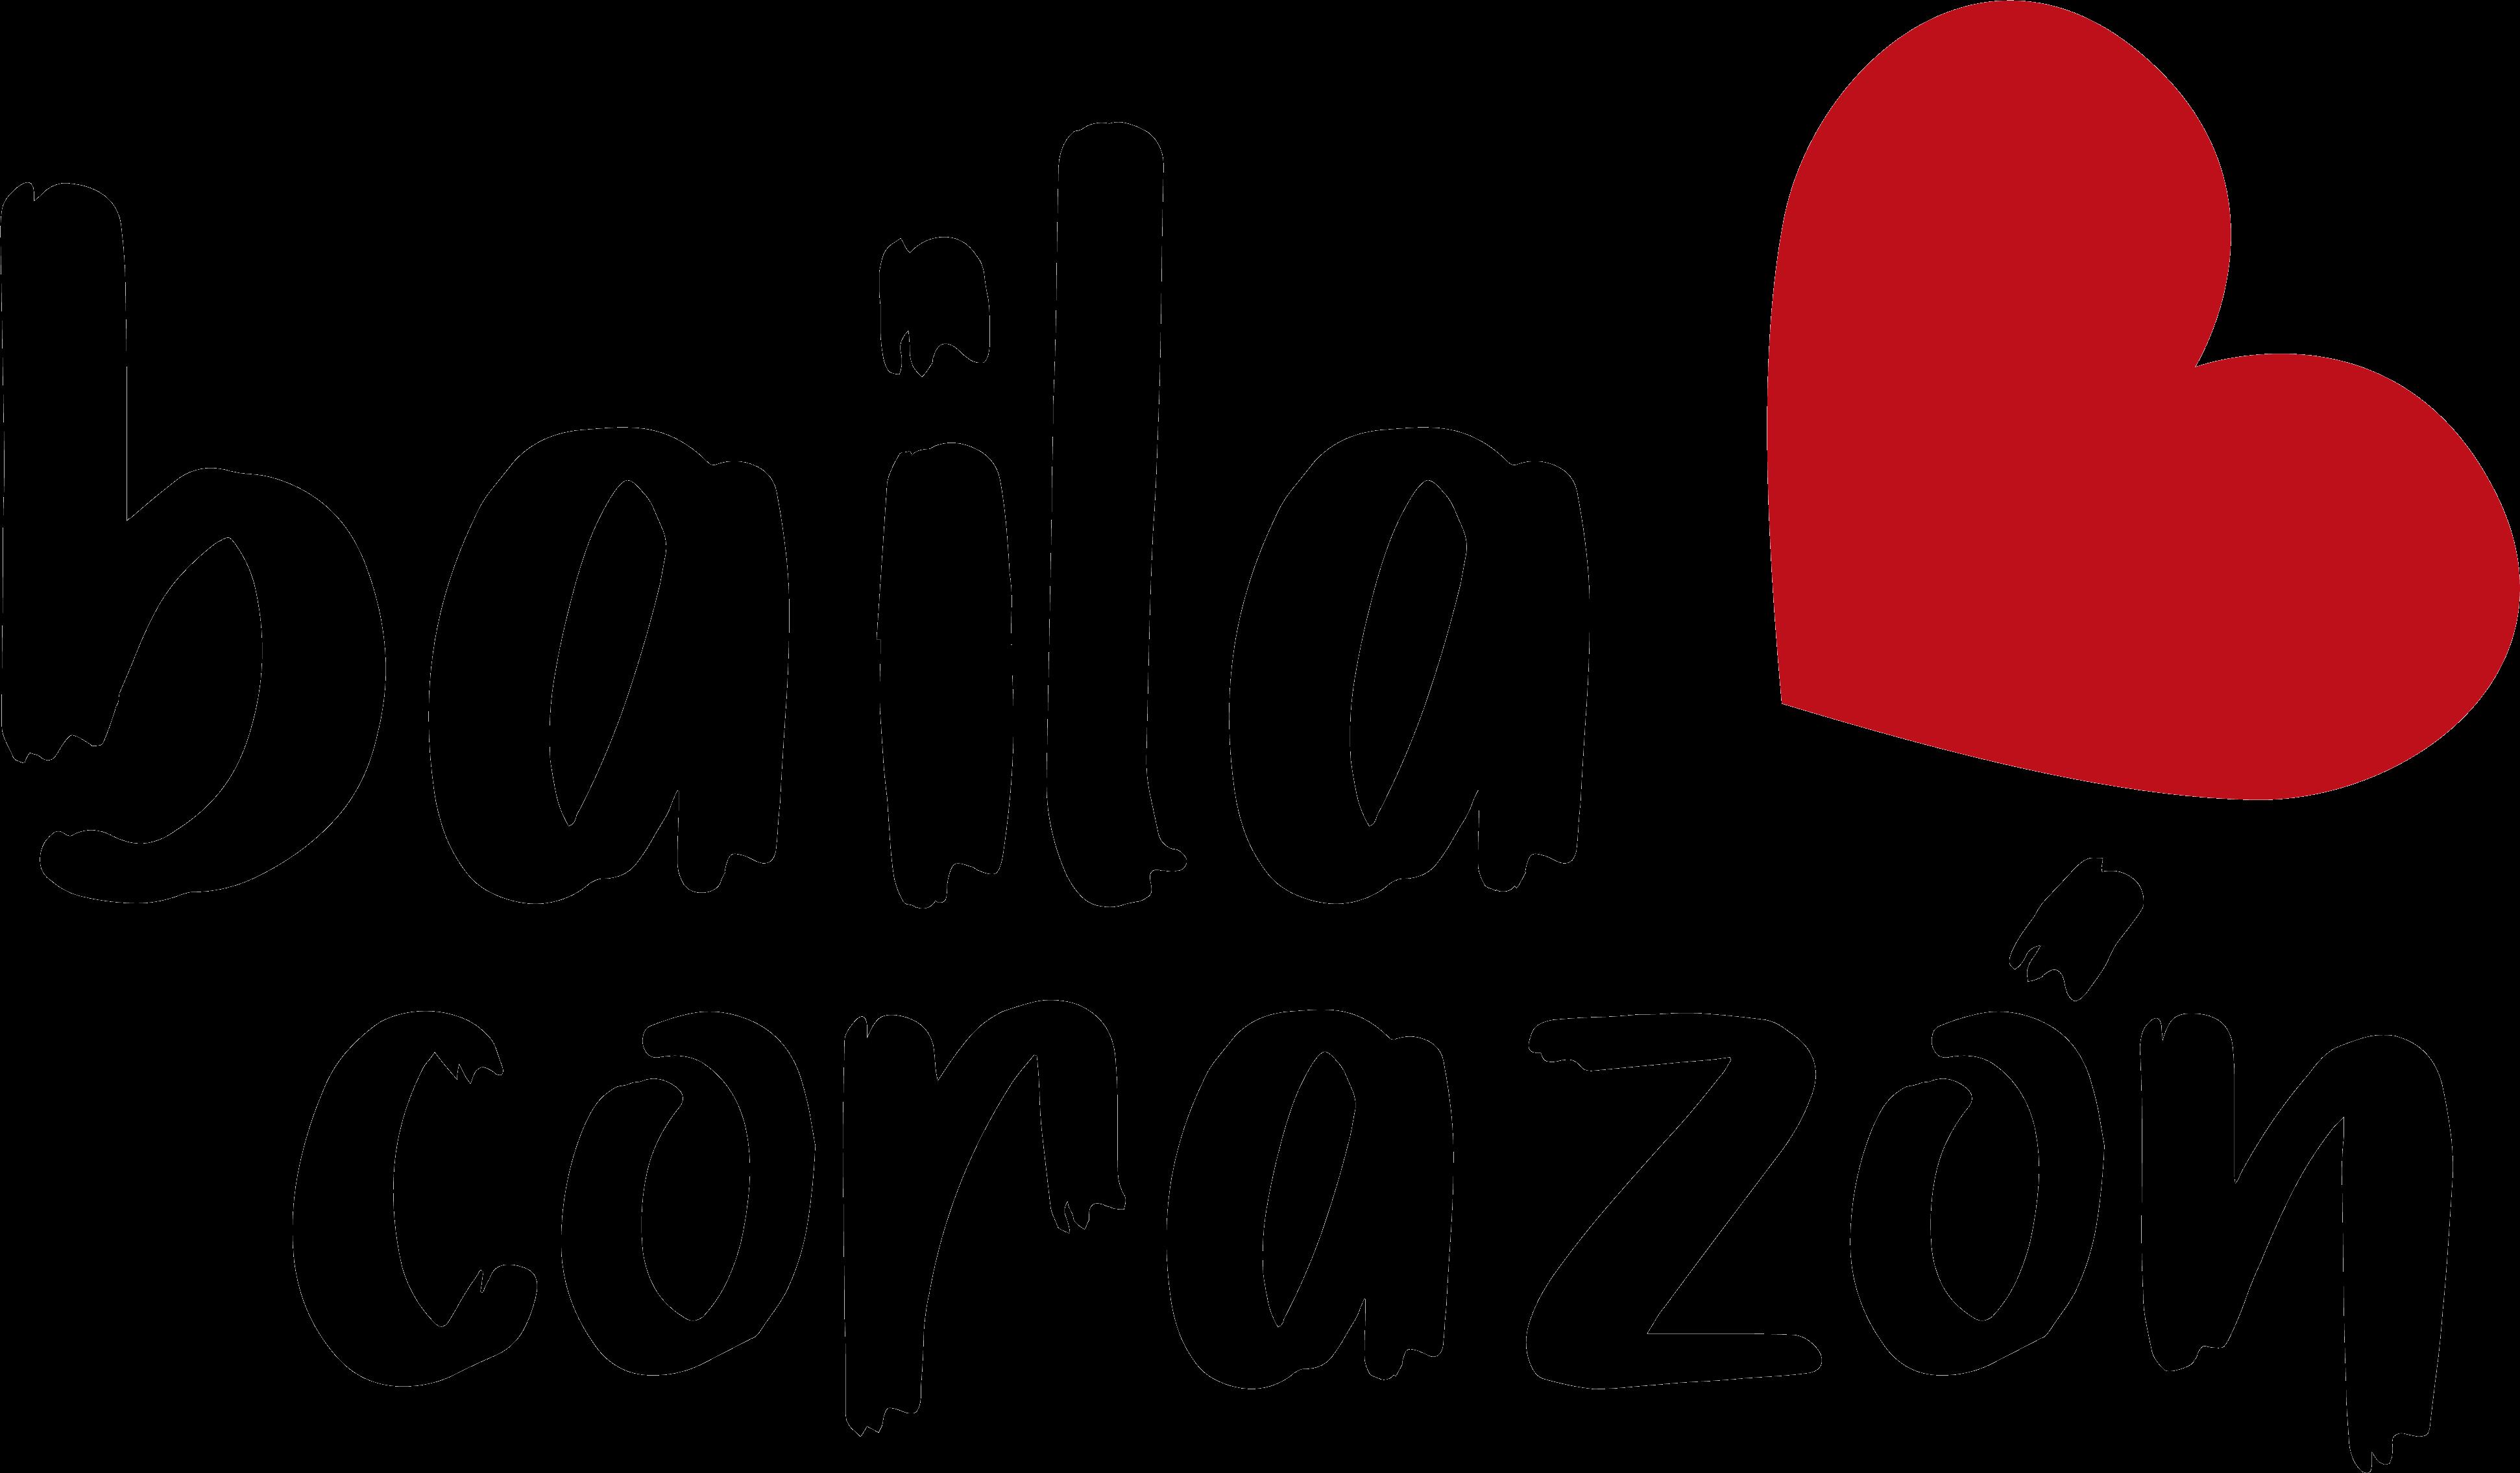 Baila Corazon